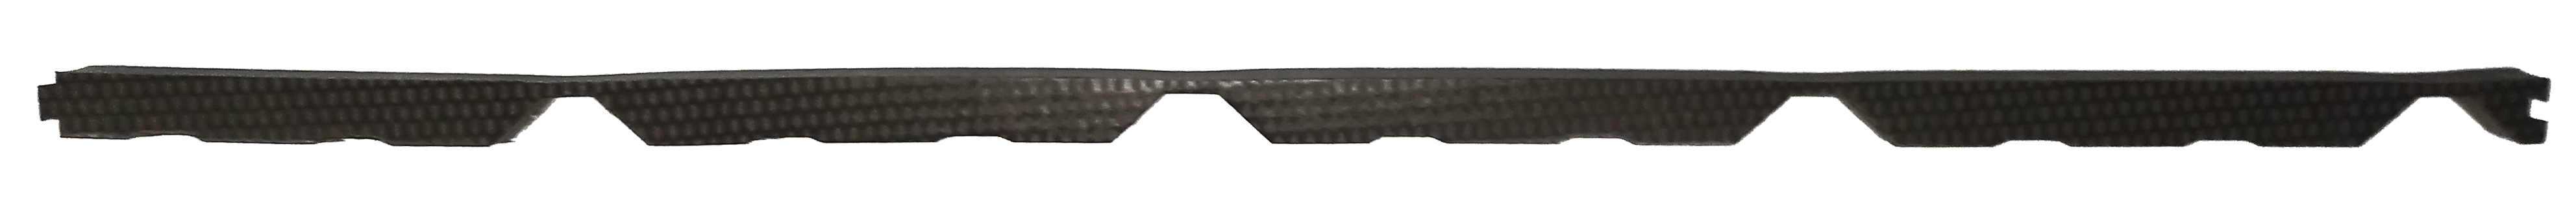 PRCL - PR-936 LARGE CLOSURE